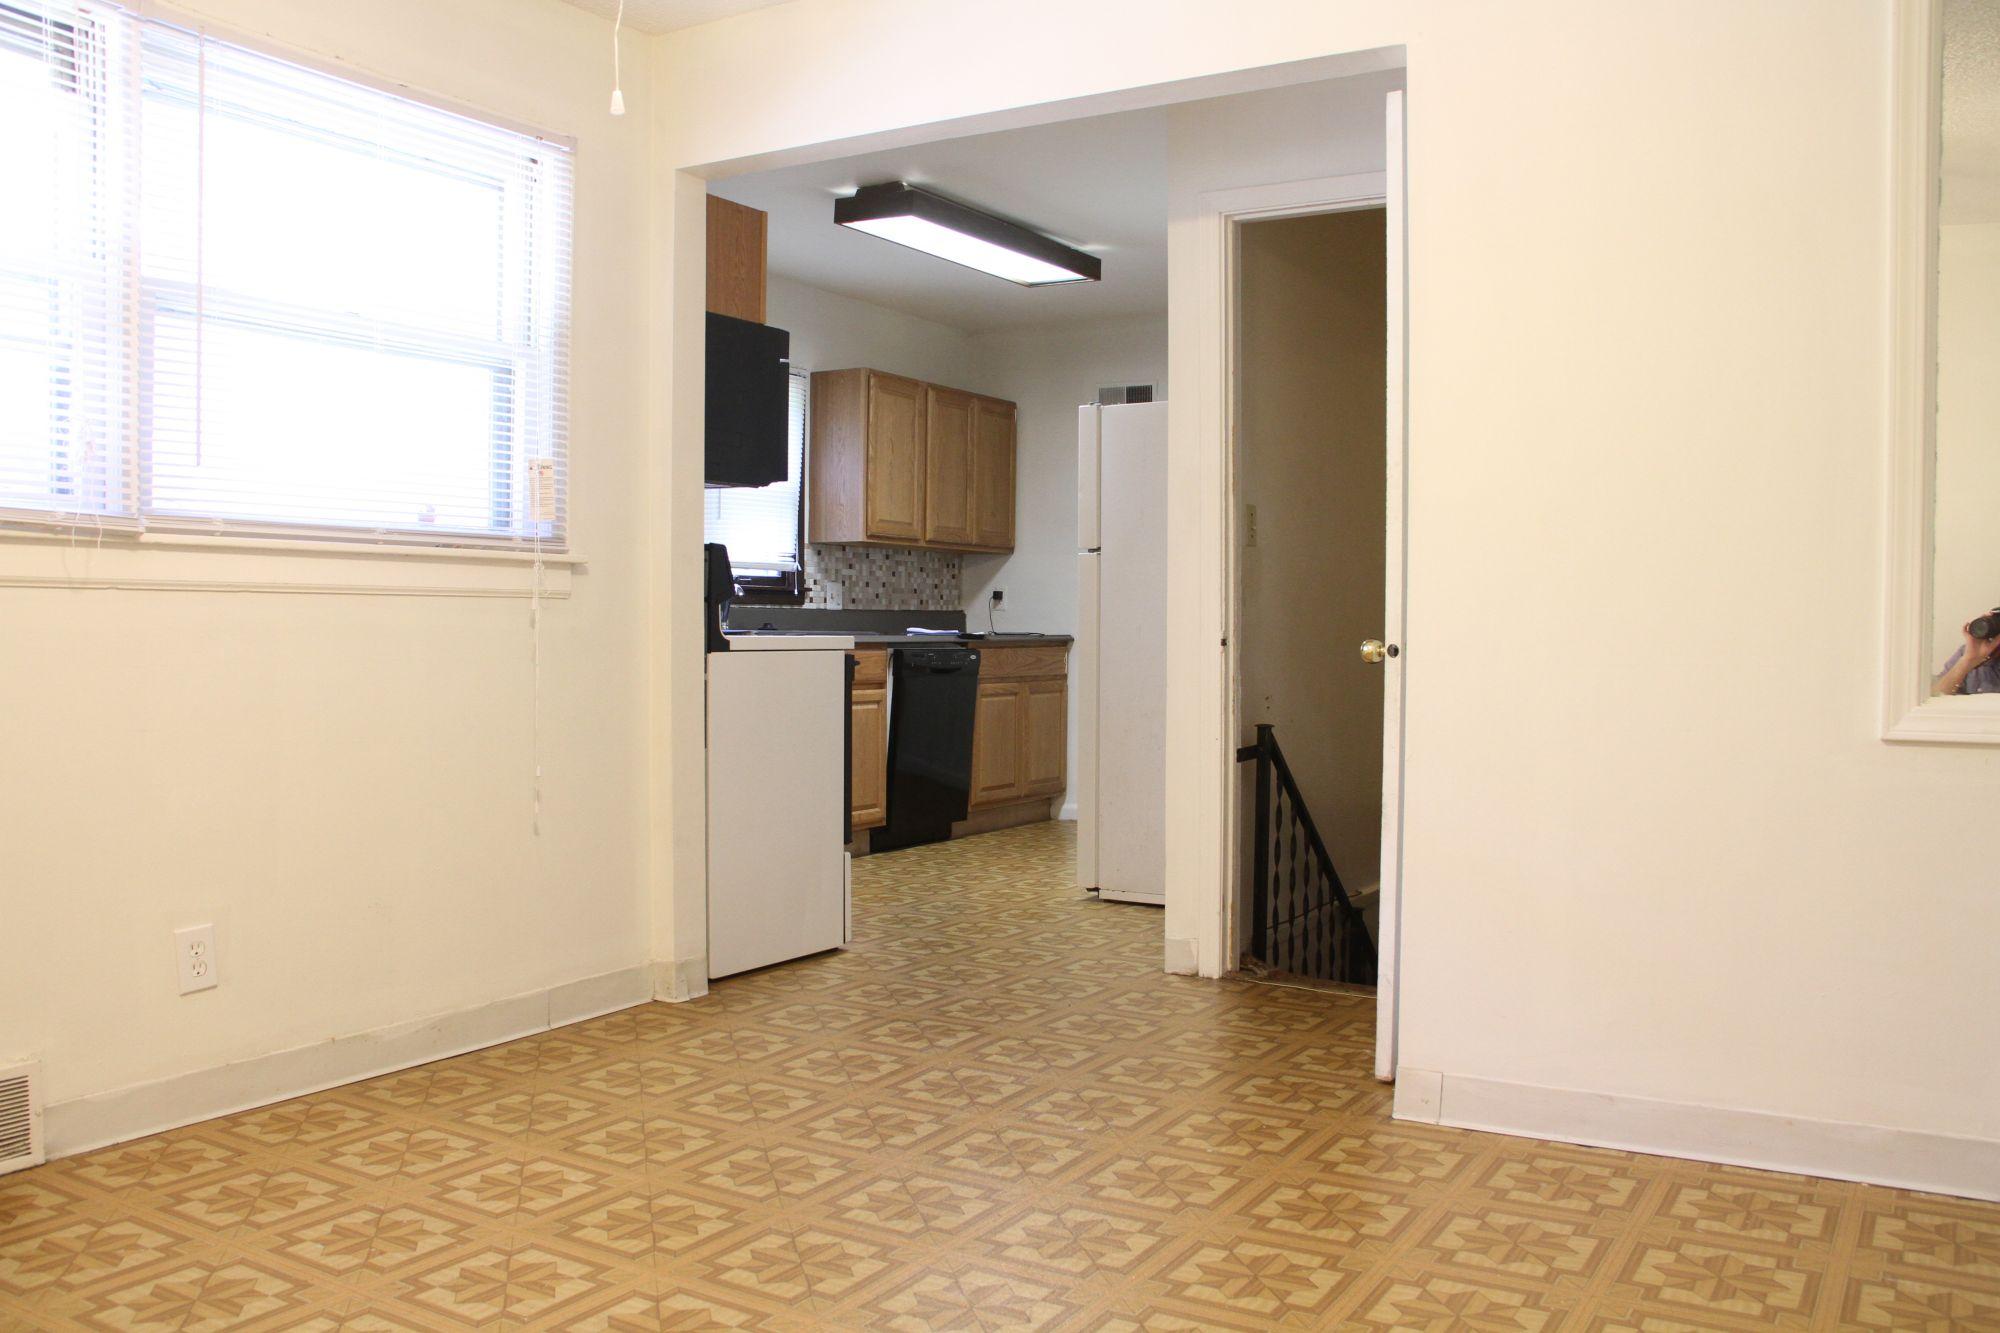 Apartments Near Champaign 801 S. State St for Champaign Students in Champaign, IL